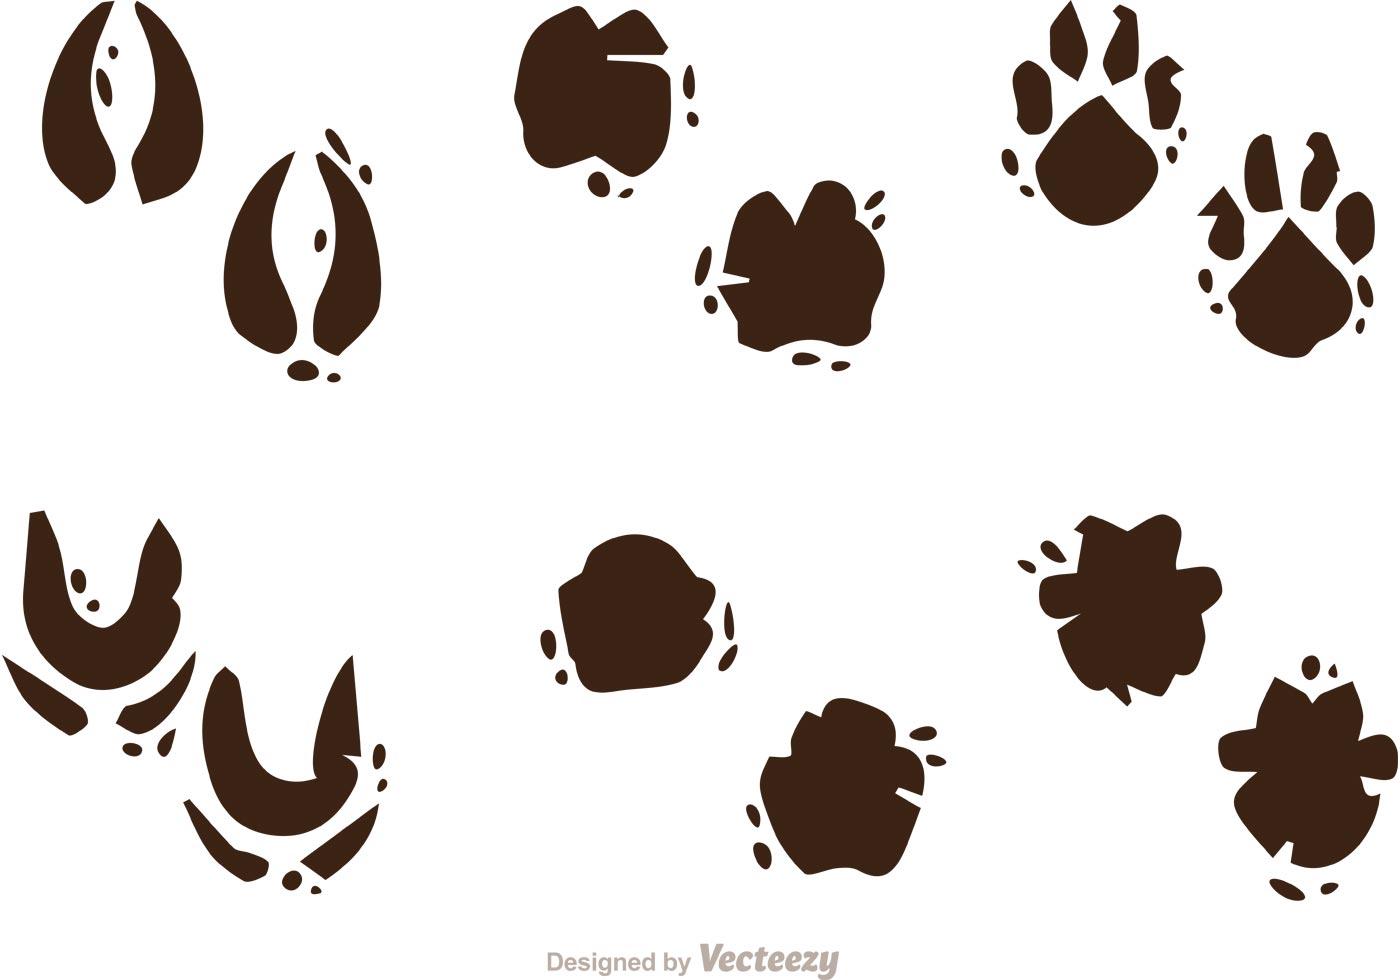 Vectors Footprint  - Download Vectors Muddy Free Animal